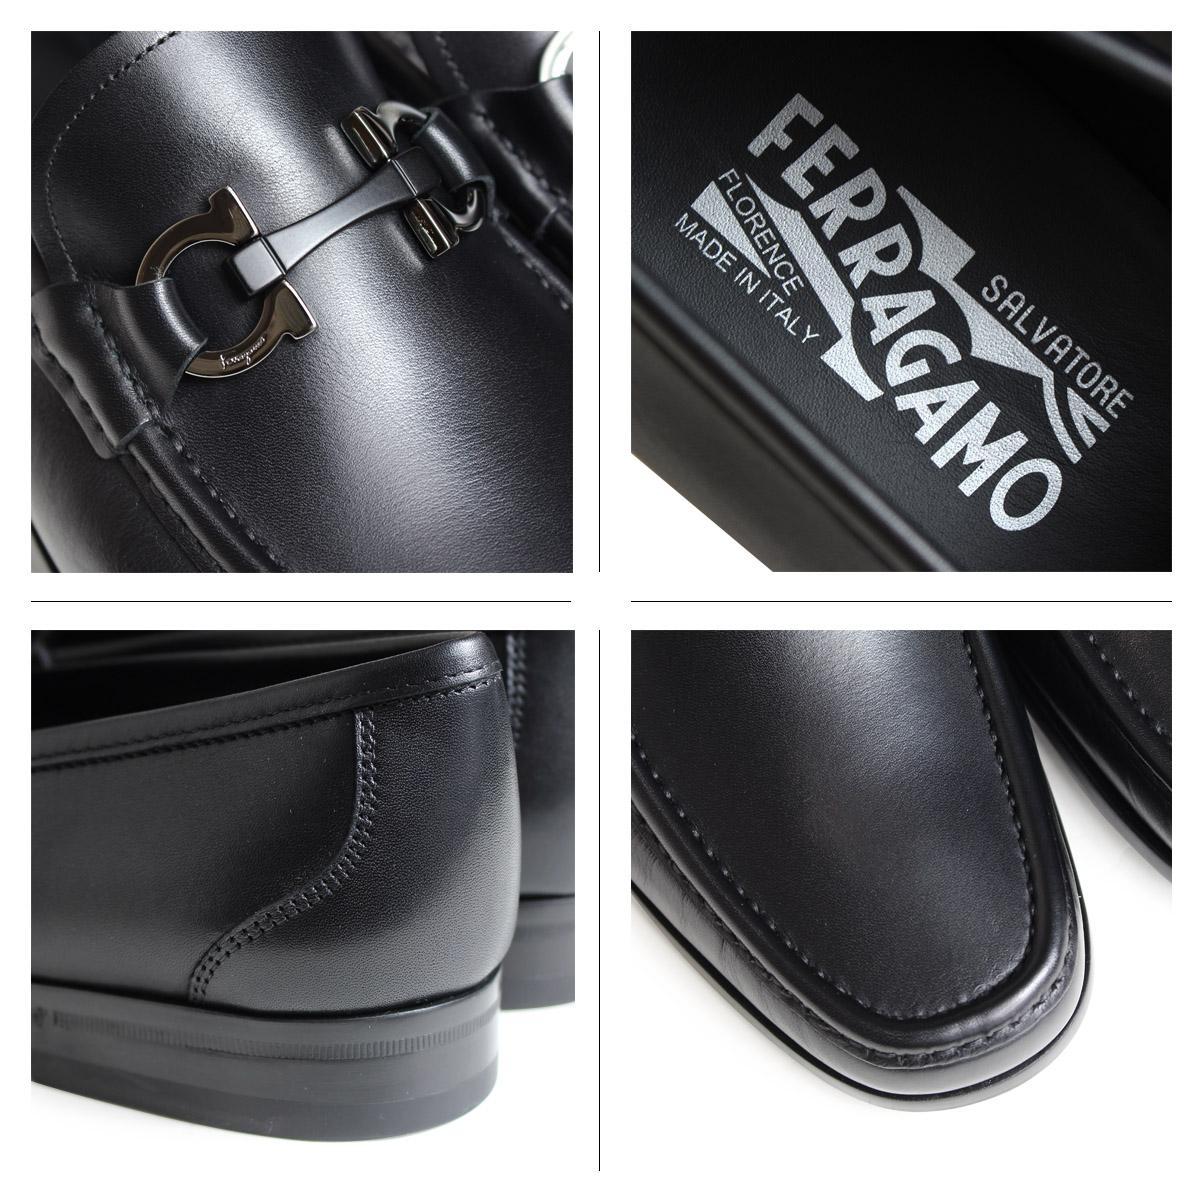 be59c80660a Salvatore Ferragamo shoes men Ferragamo bit loafer moccasins shoes  GRANDIOSO black 29392 647705  5 17 Shinnyu load